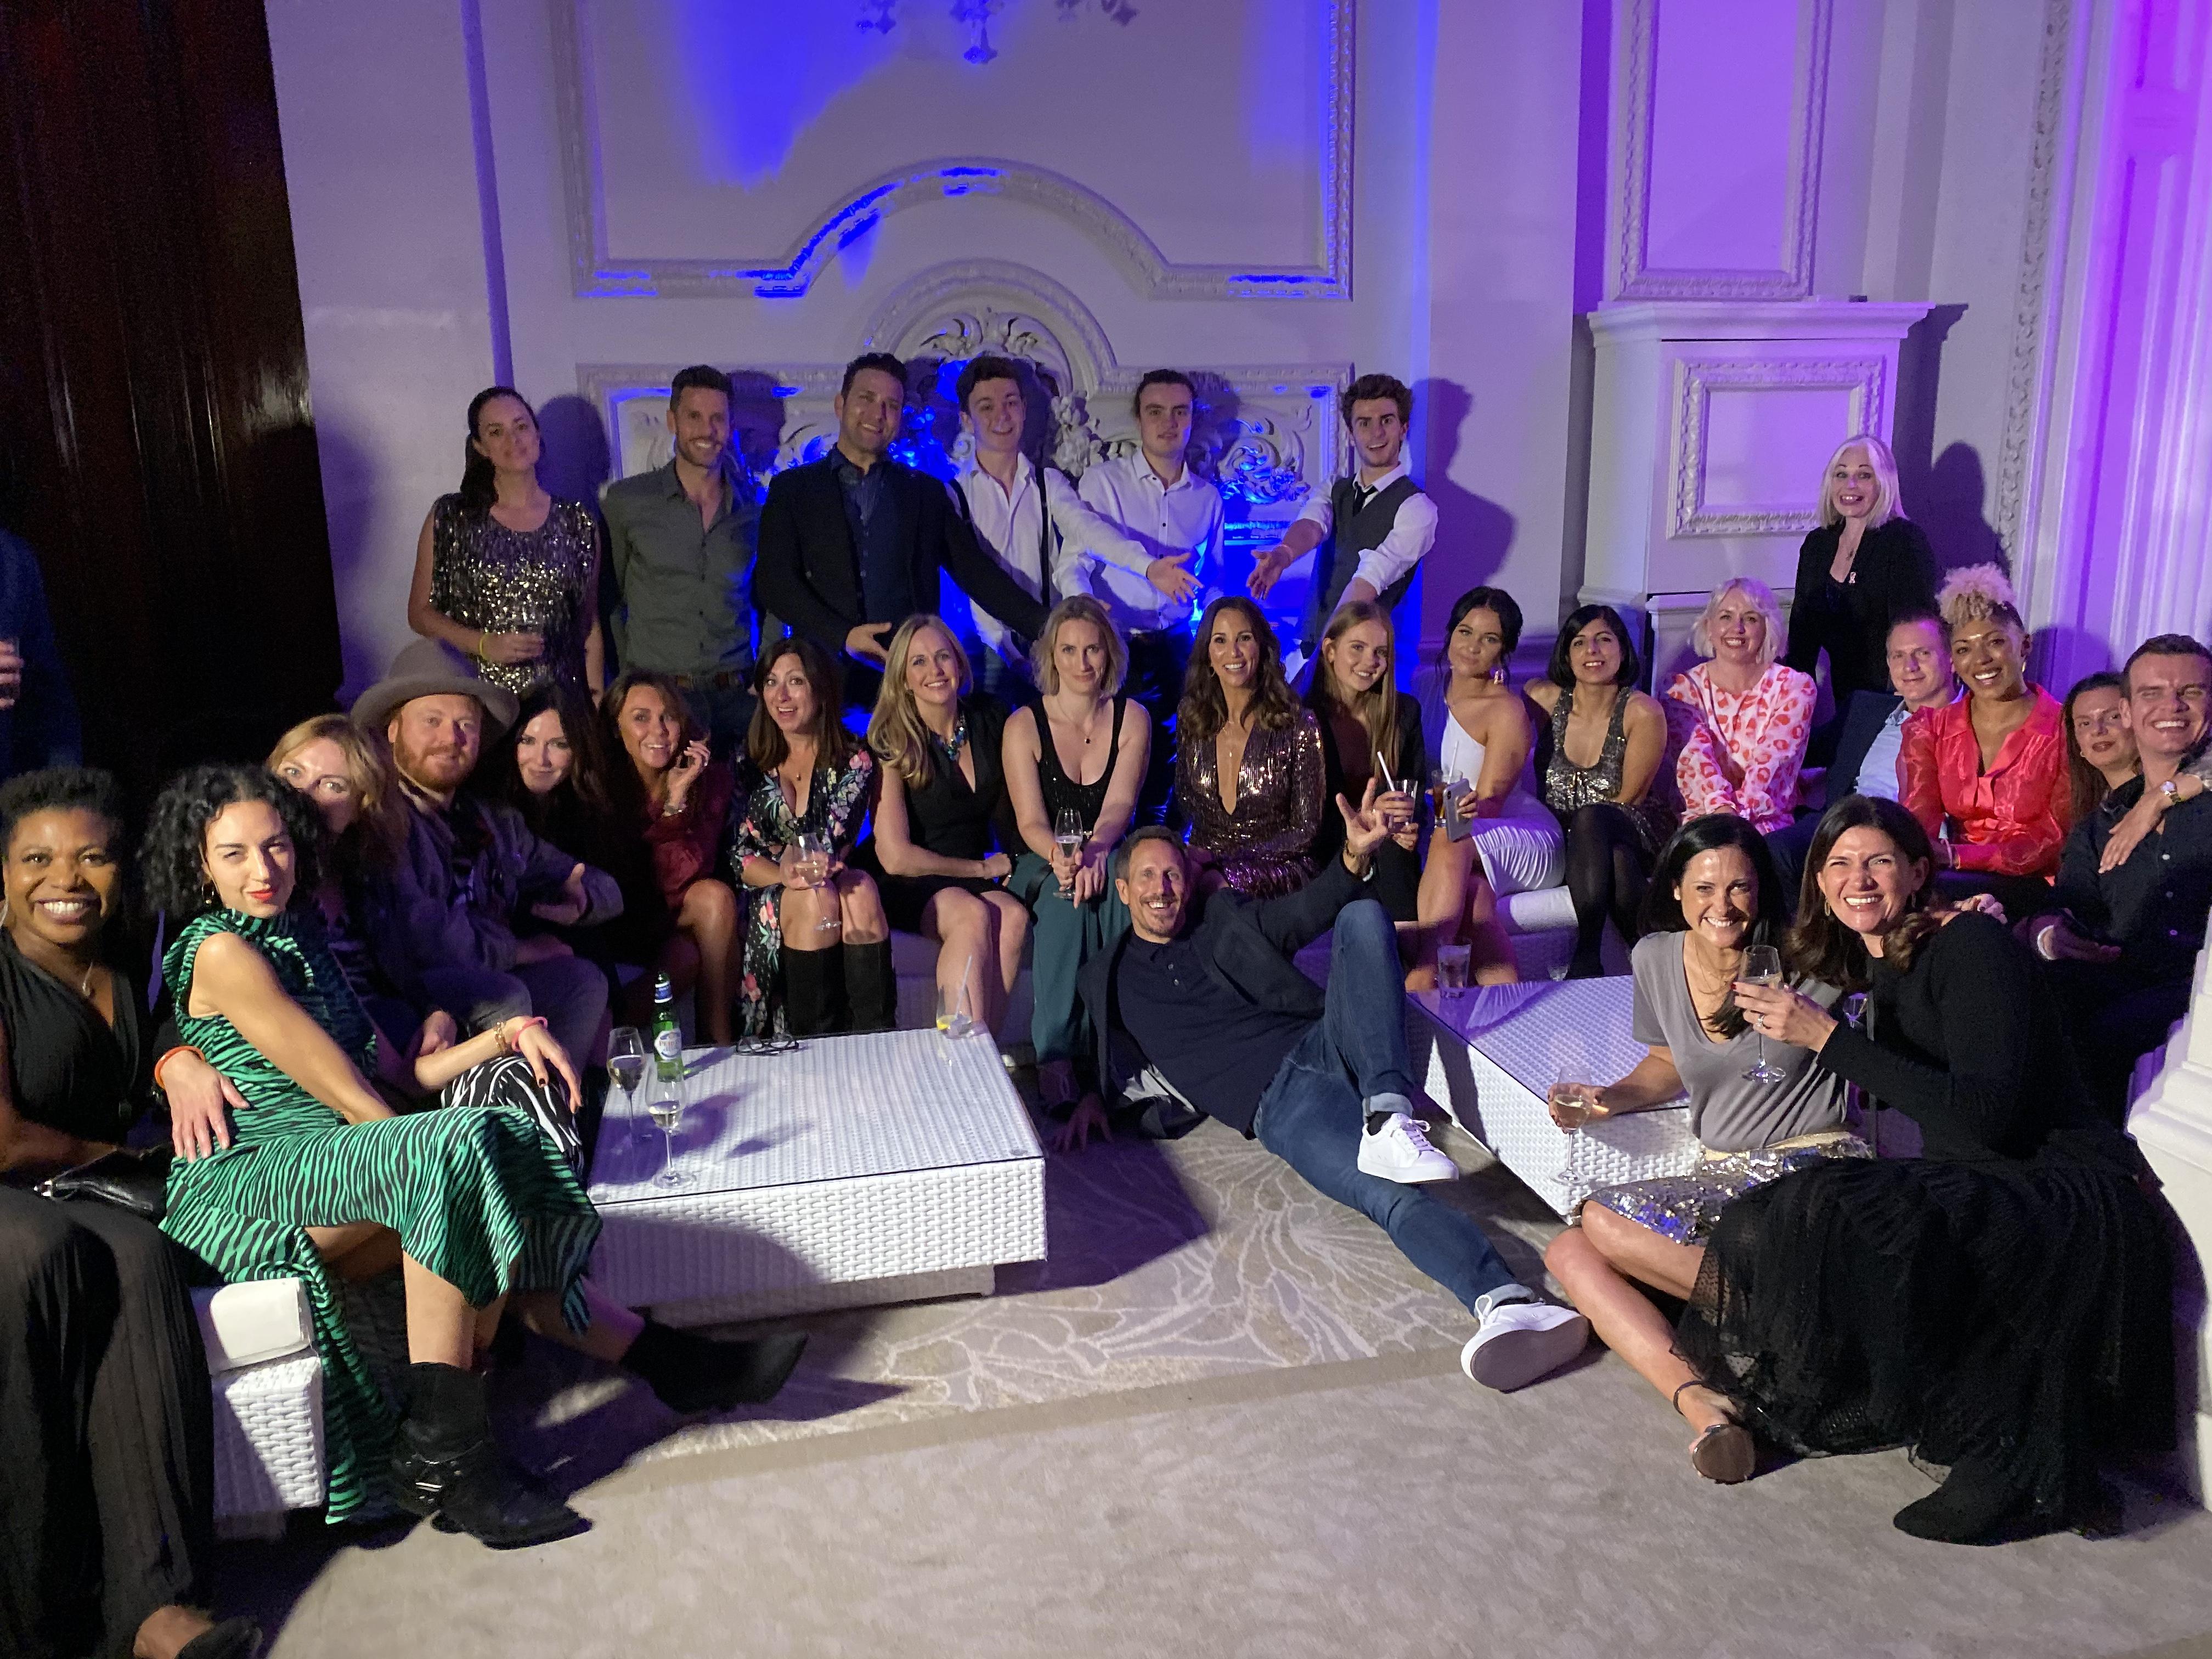 sofa hire: Andrea Mclean 50th birthday